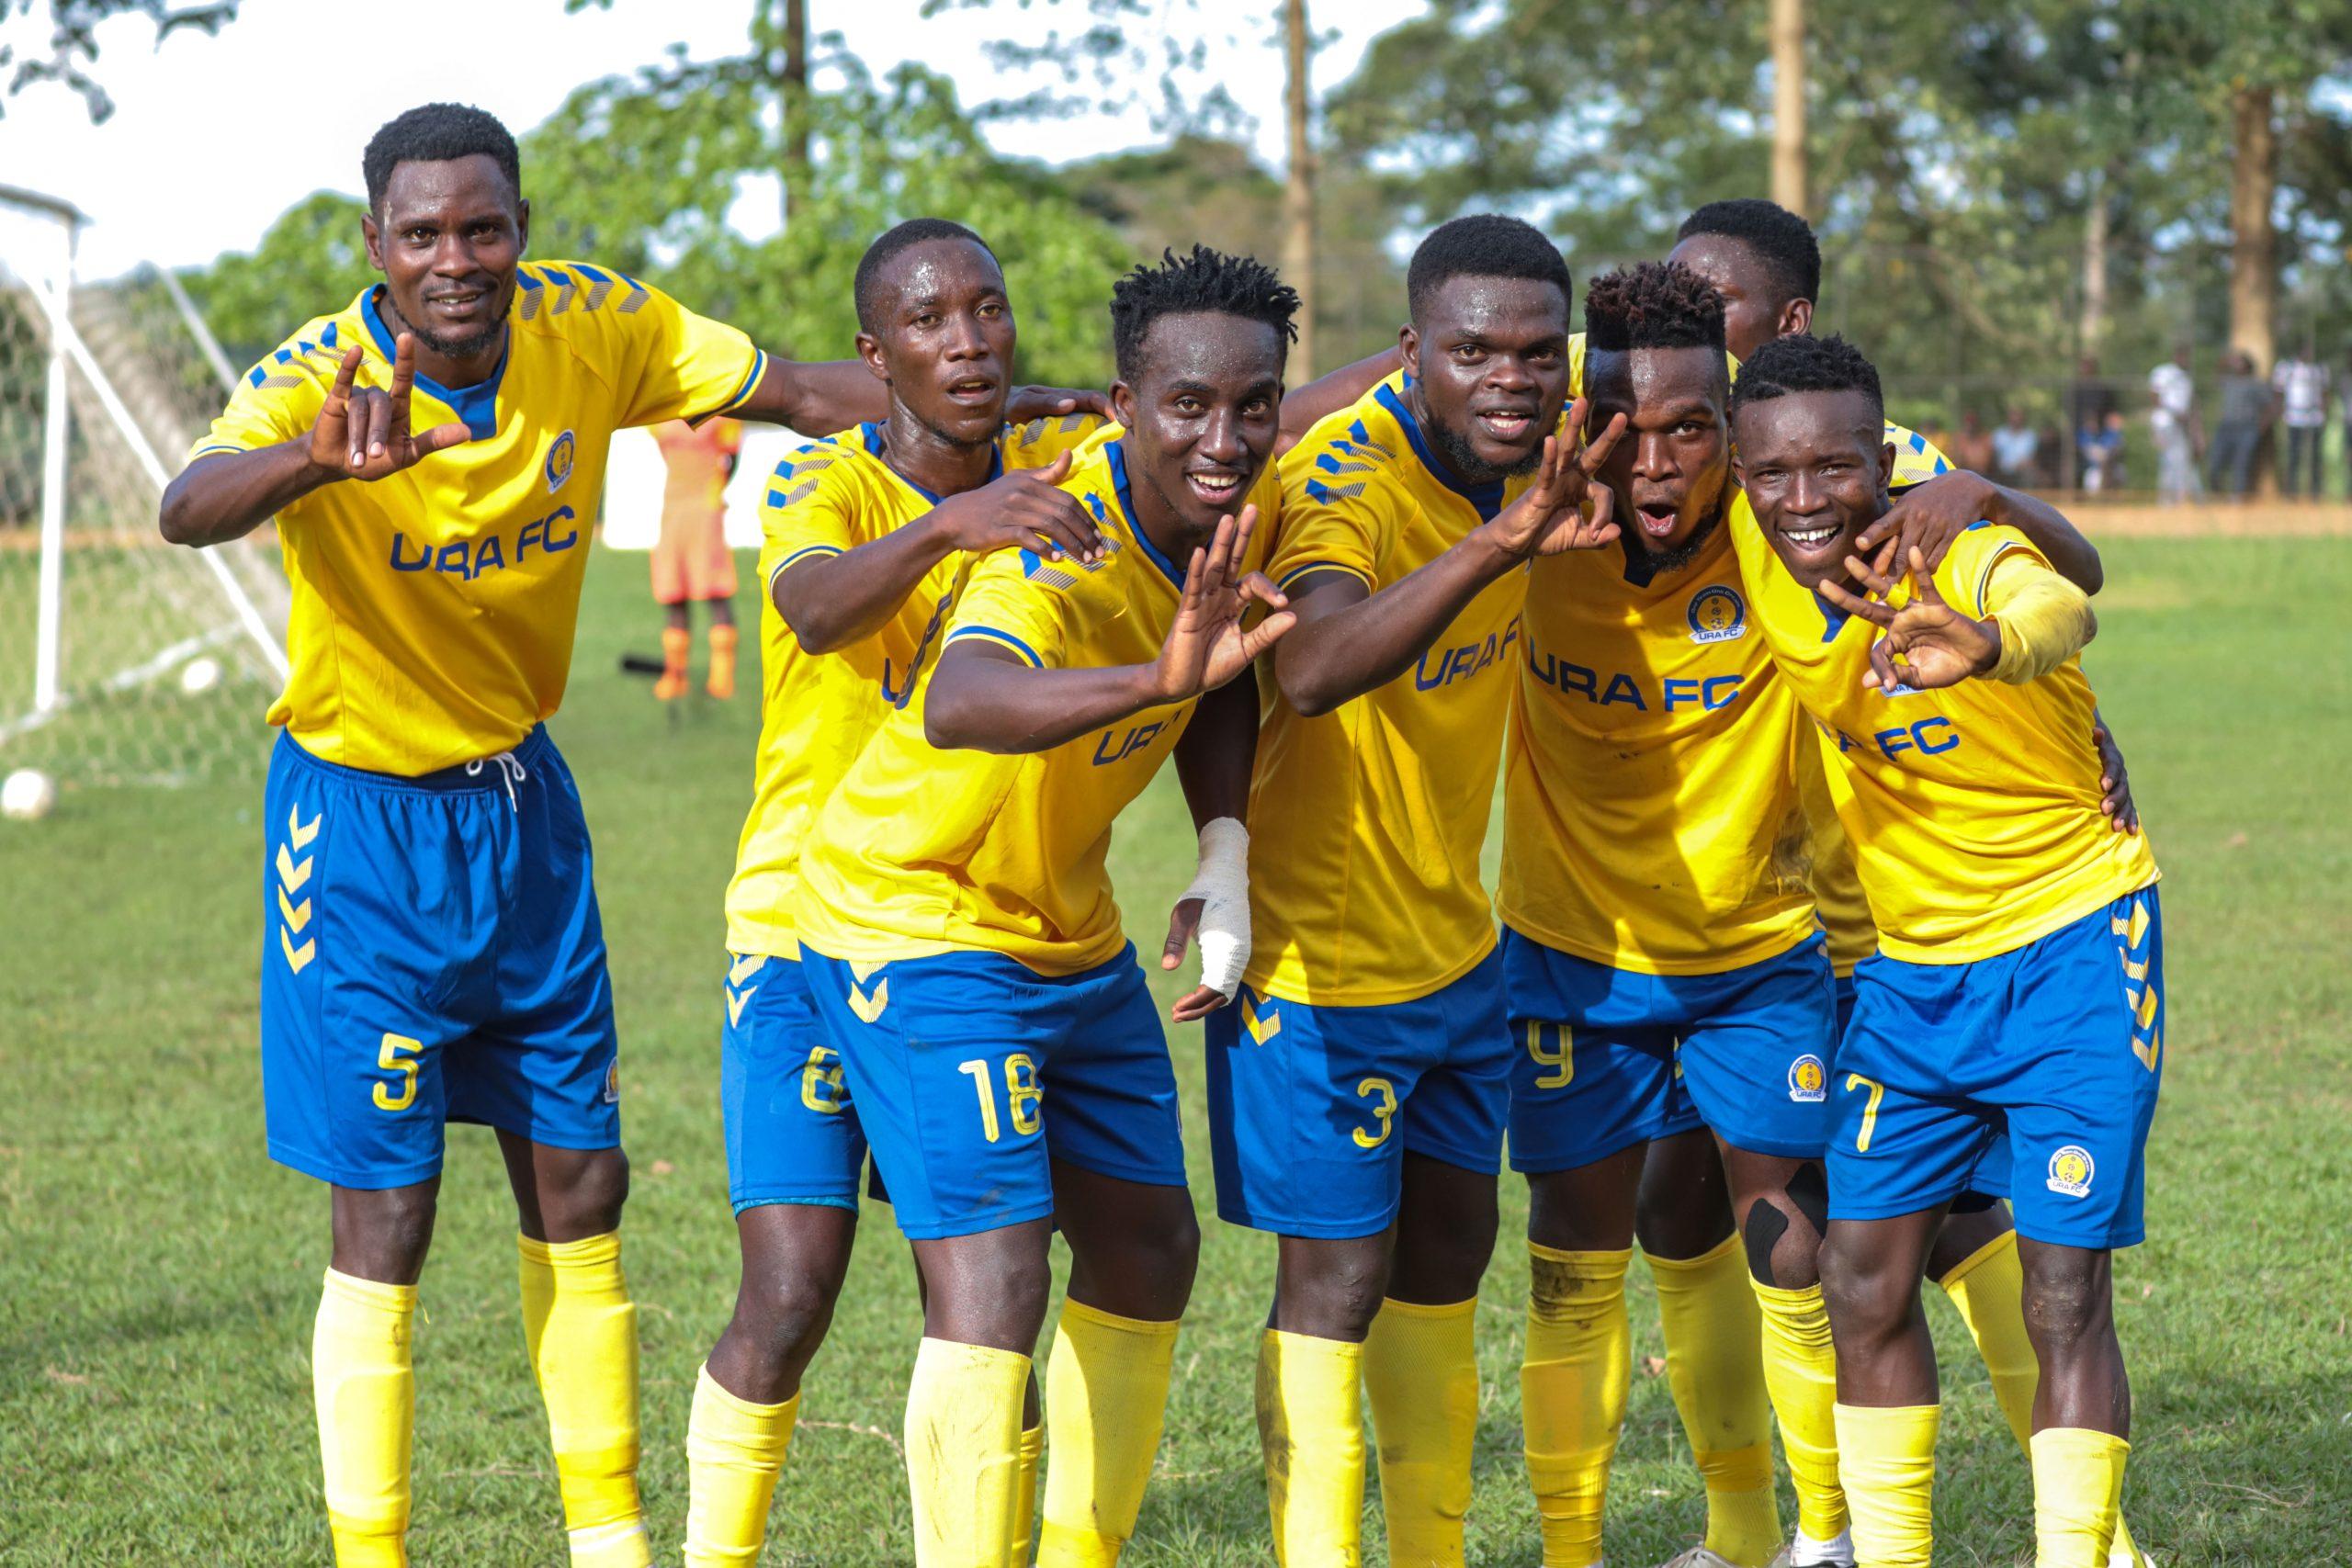 Match Review: URA FC vs KCCA FC